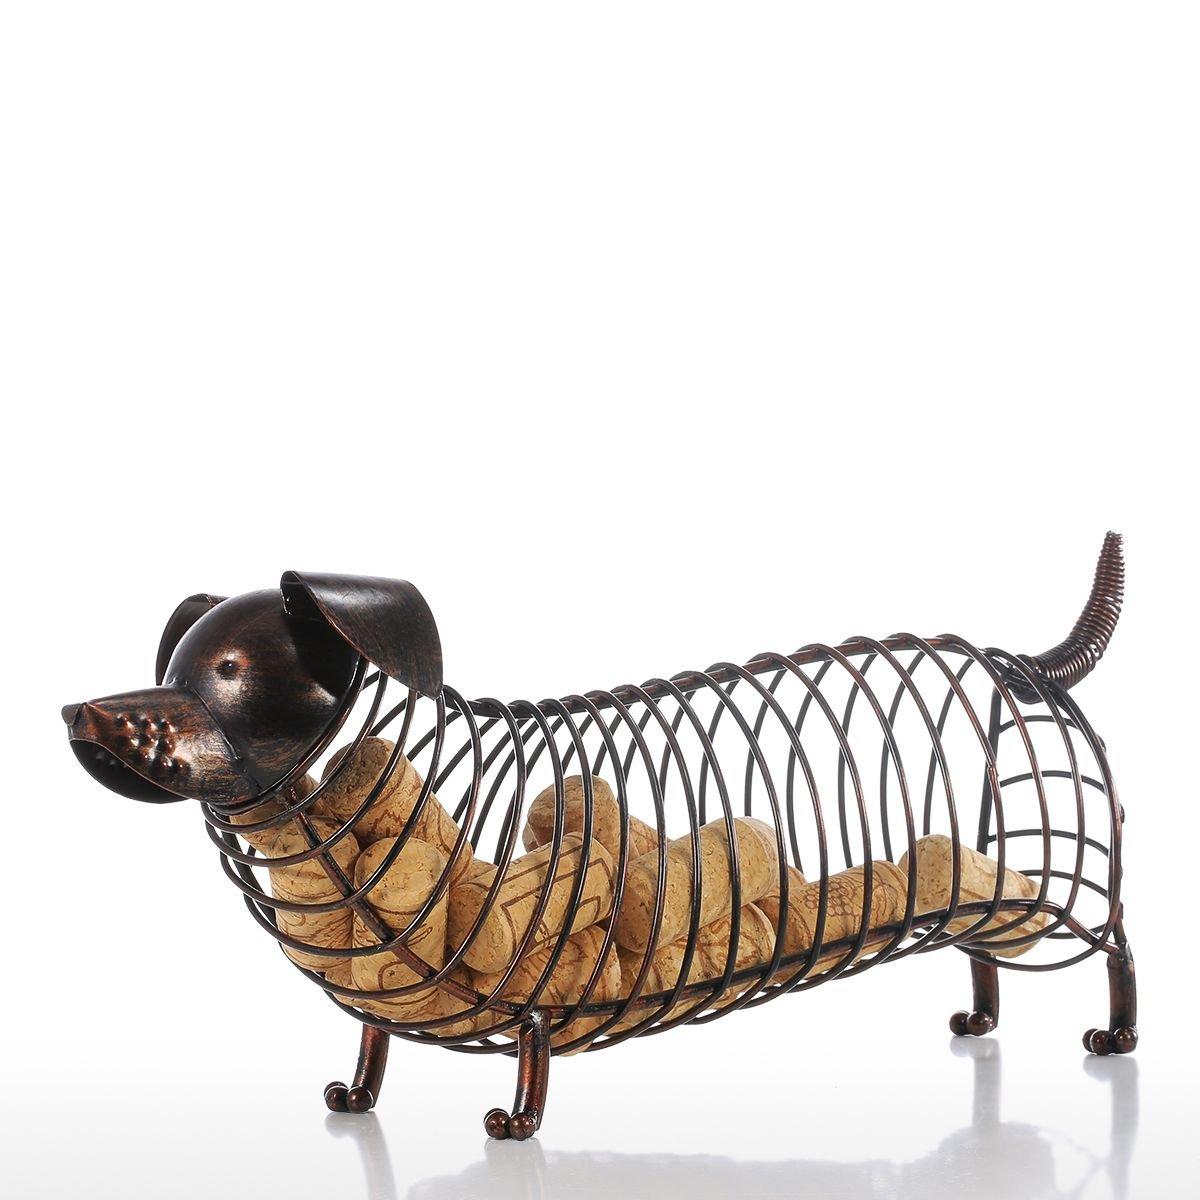 ARISLUX Pearl Rivet - Metal Animal Figurines Dachshund Wine Cork Container Modern Artificial Iron Craft Home Decoration Accessories Gift